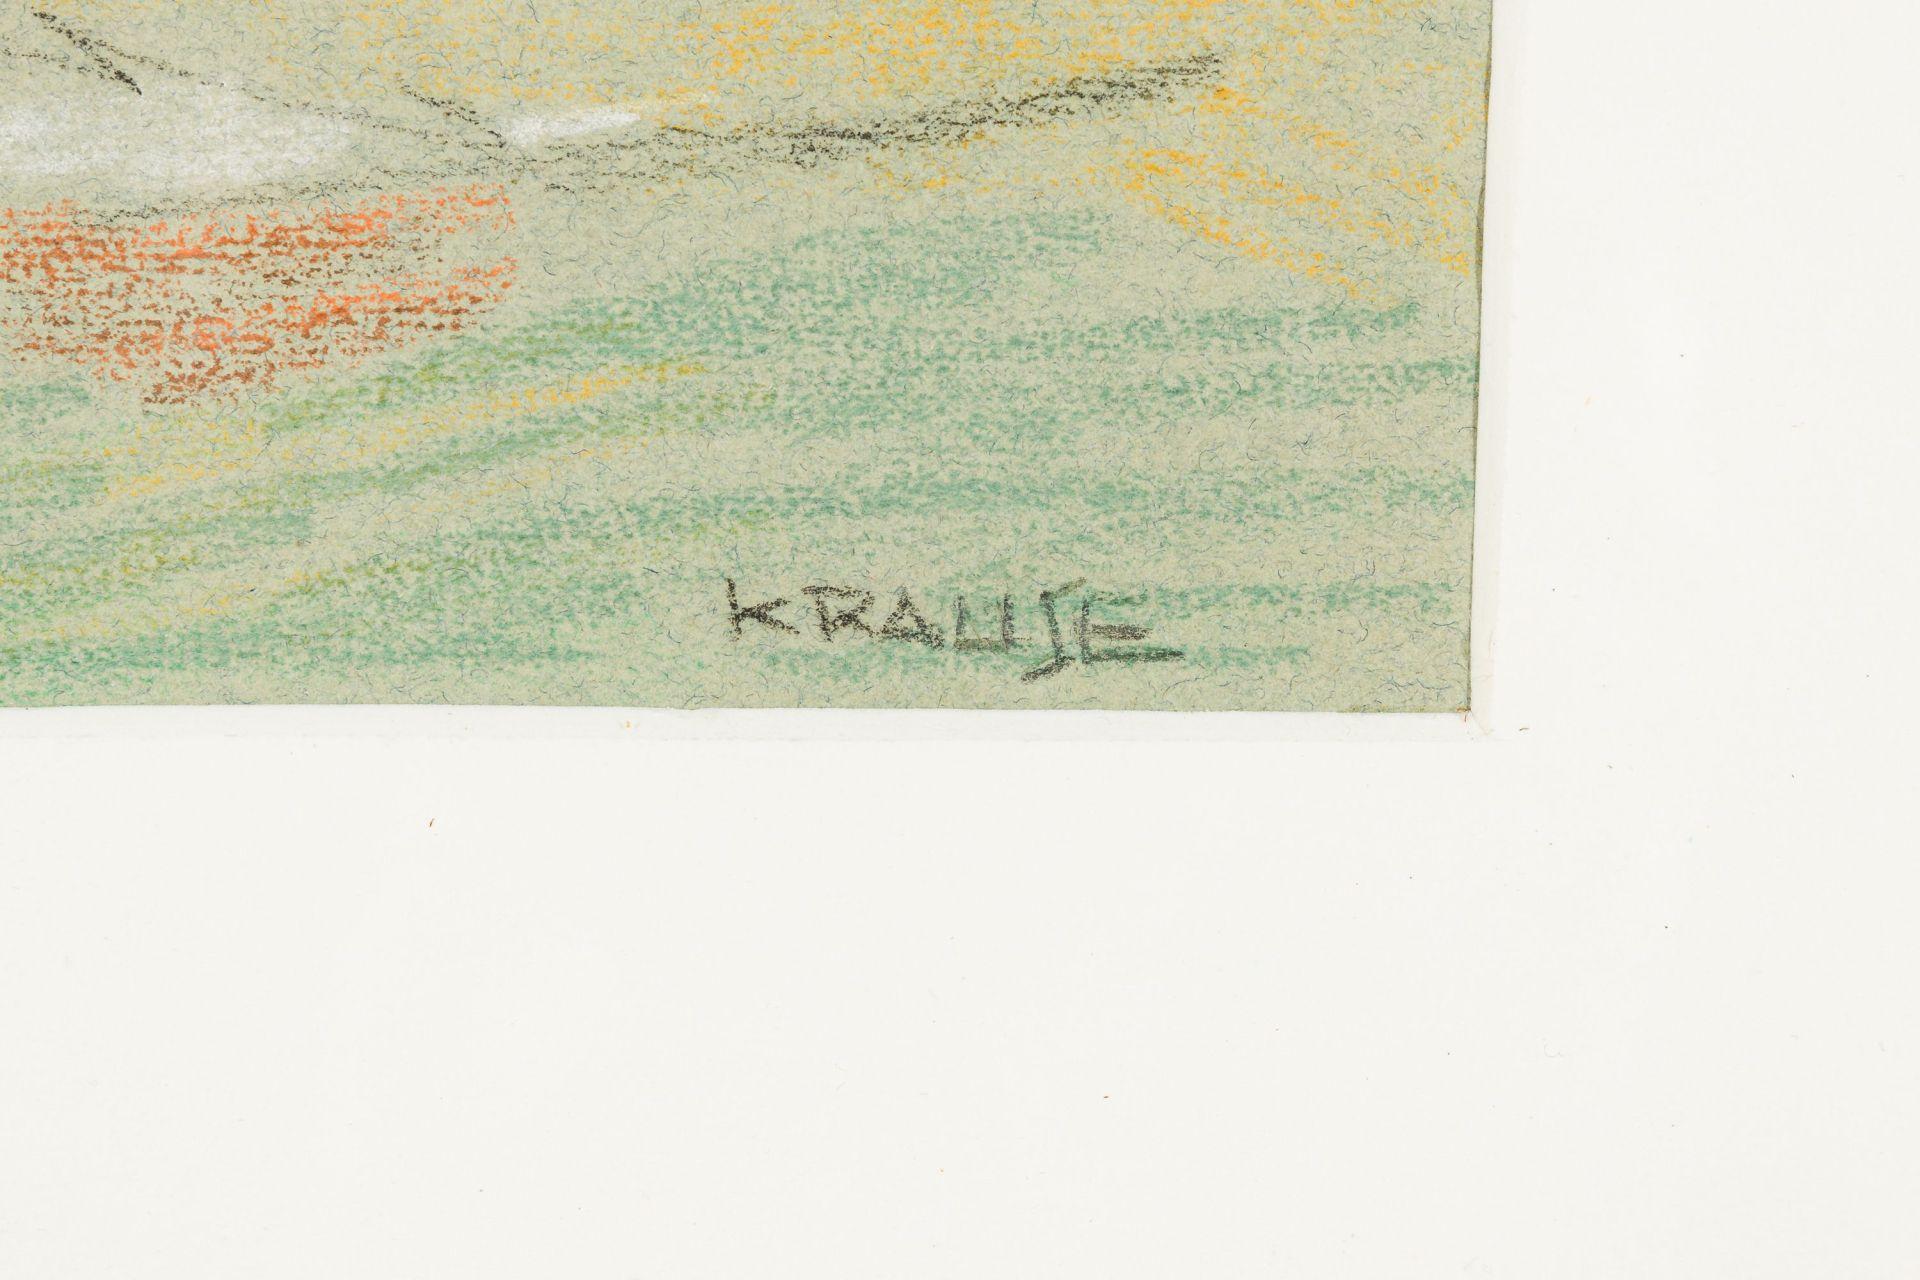 Krause Heinrich-Dalmatia